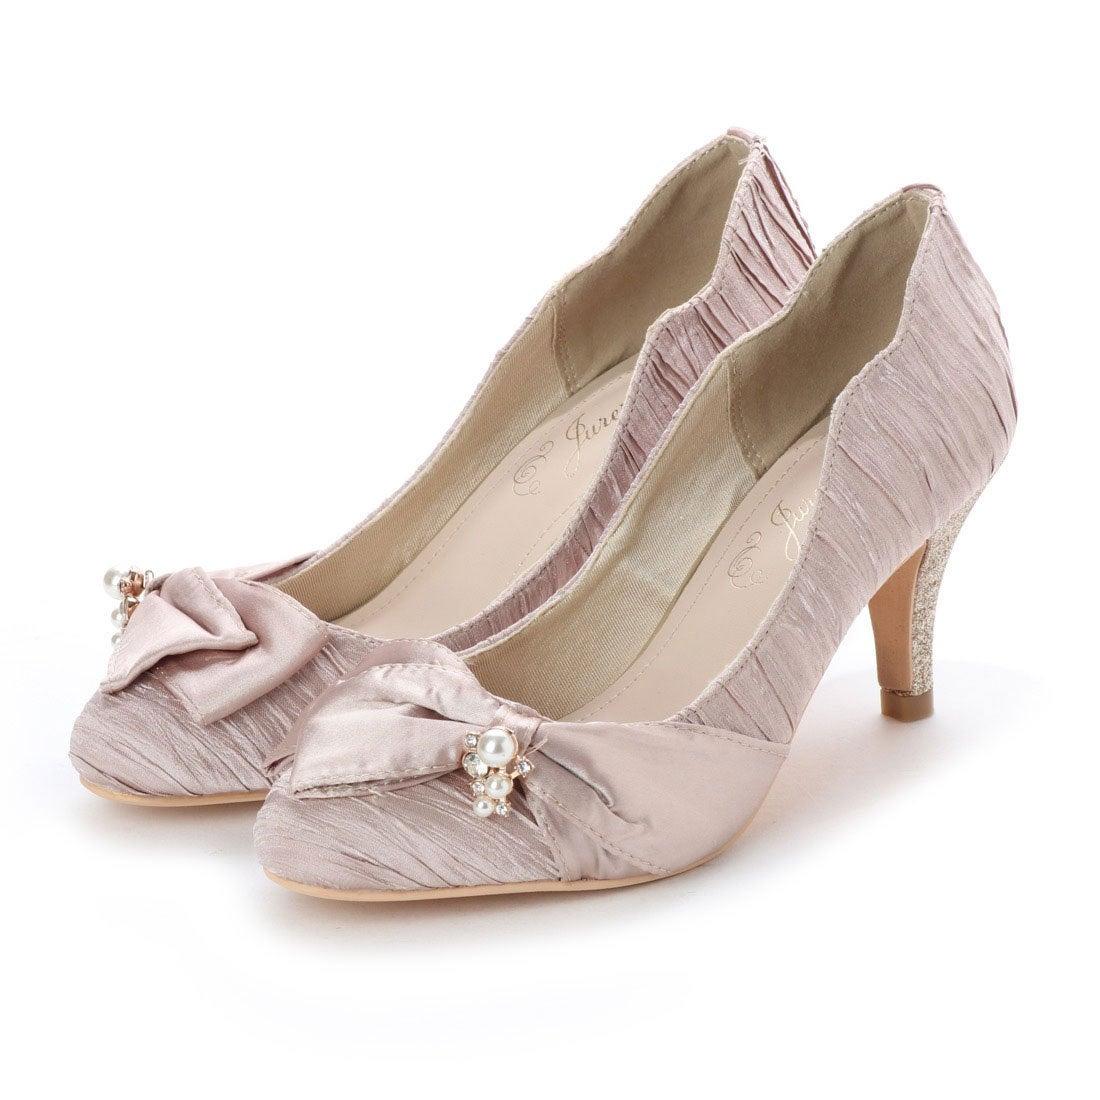 5e50a1e33845c ジュレ Jurer by vivian ビジューリボン踵スカラップラインパンプス (ベージュ) -靴&ファッション通販 ロコンド〜自宅で試着、気軽に返品